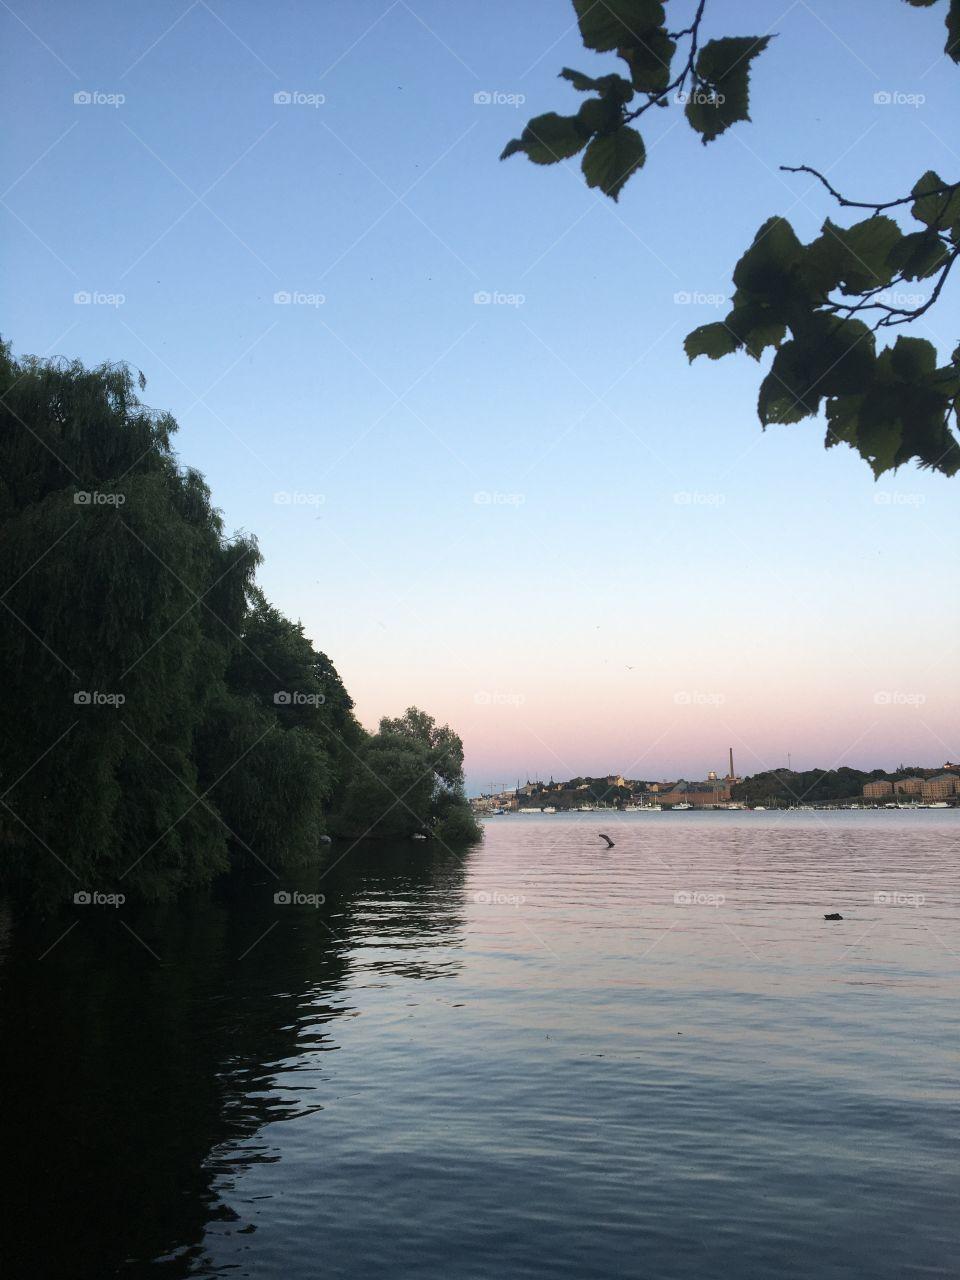 Summer lake evening